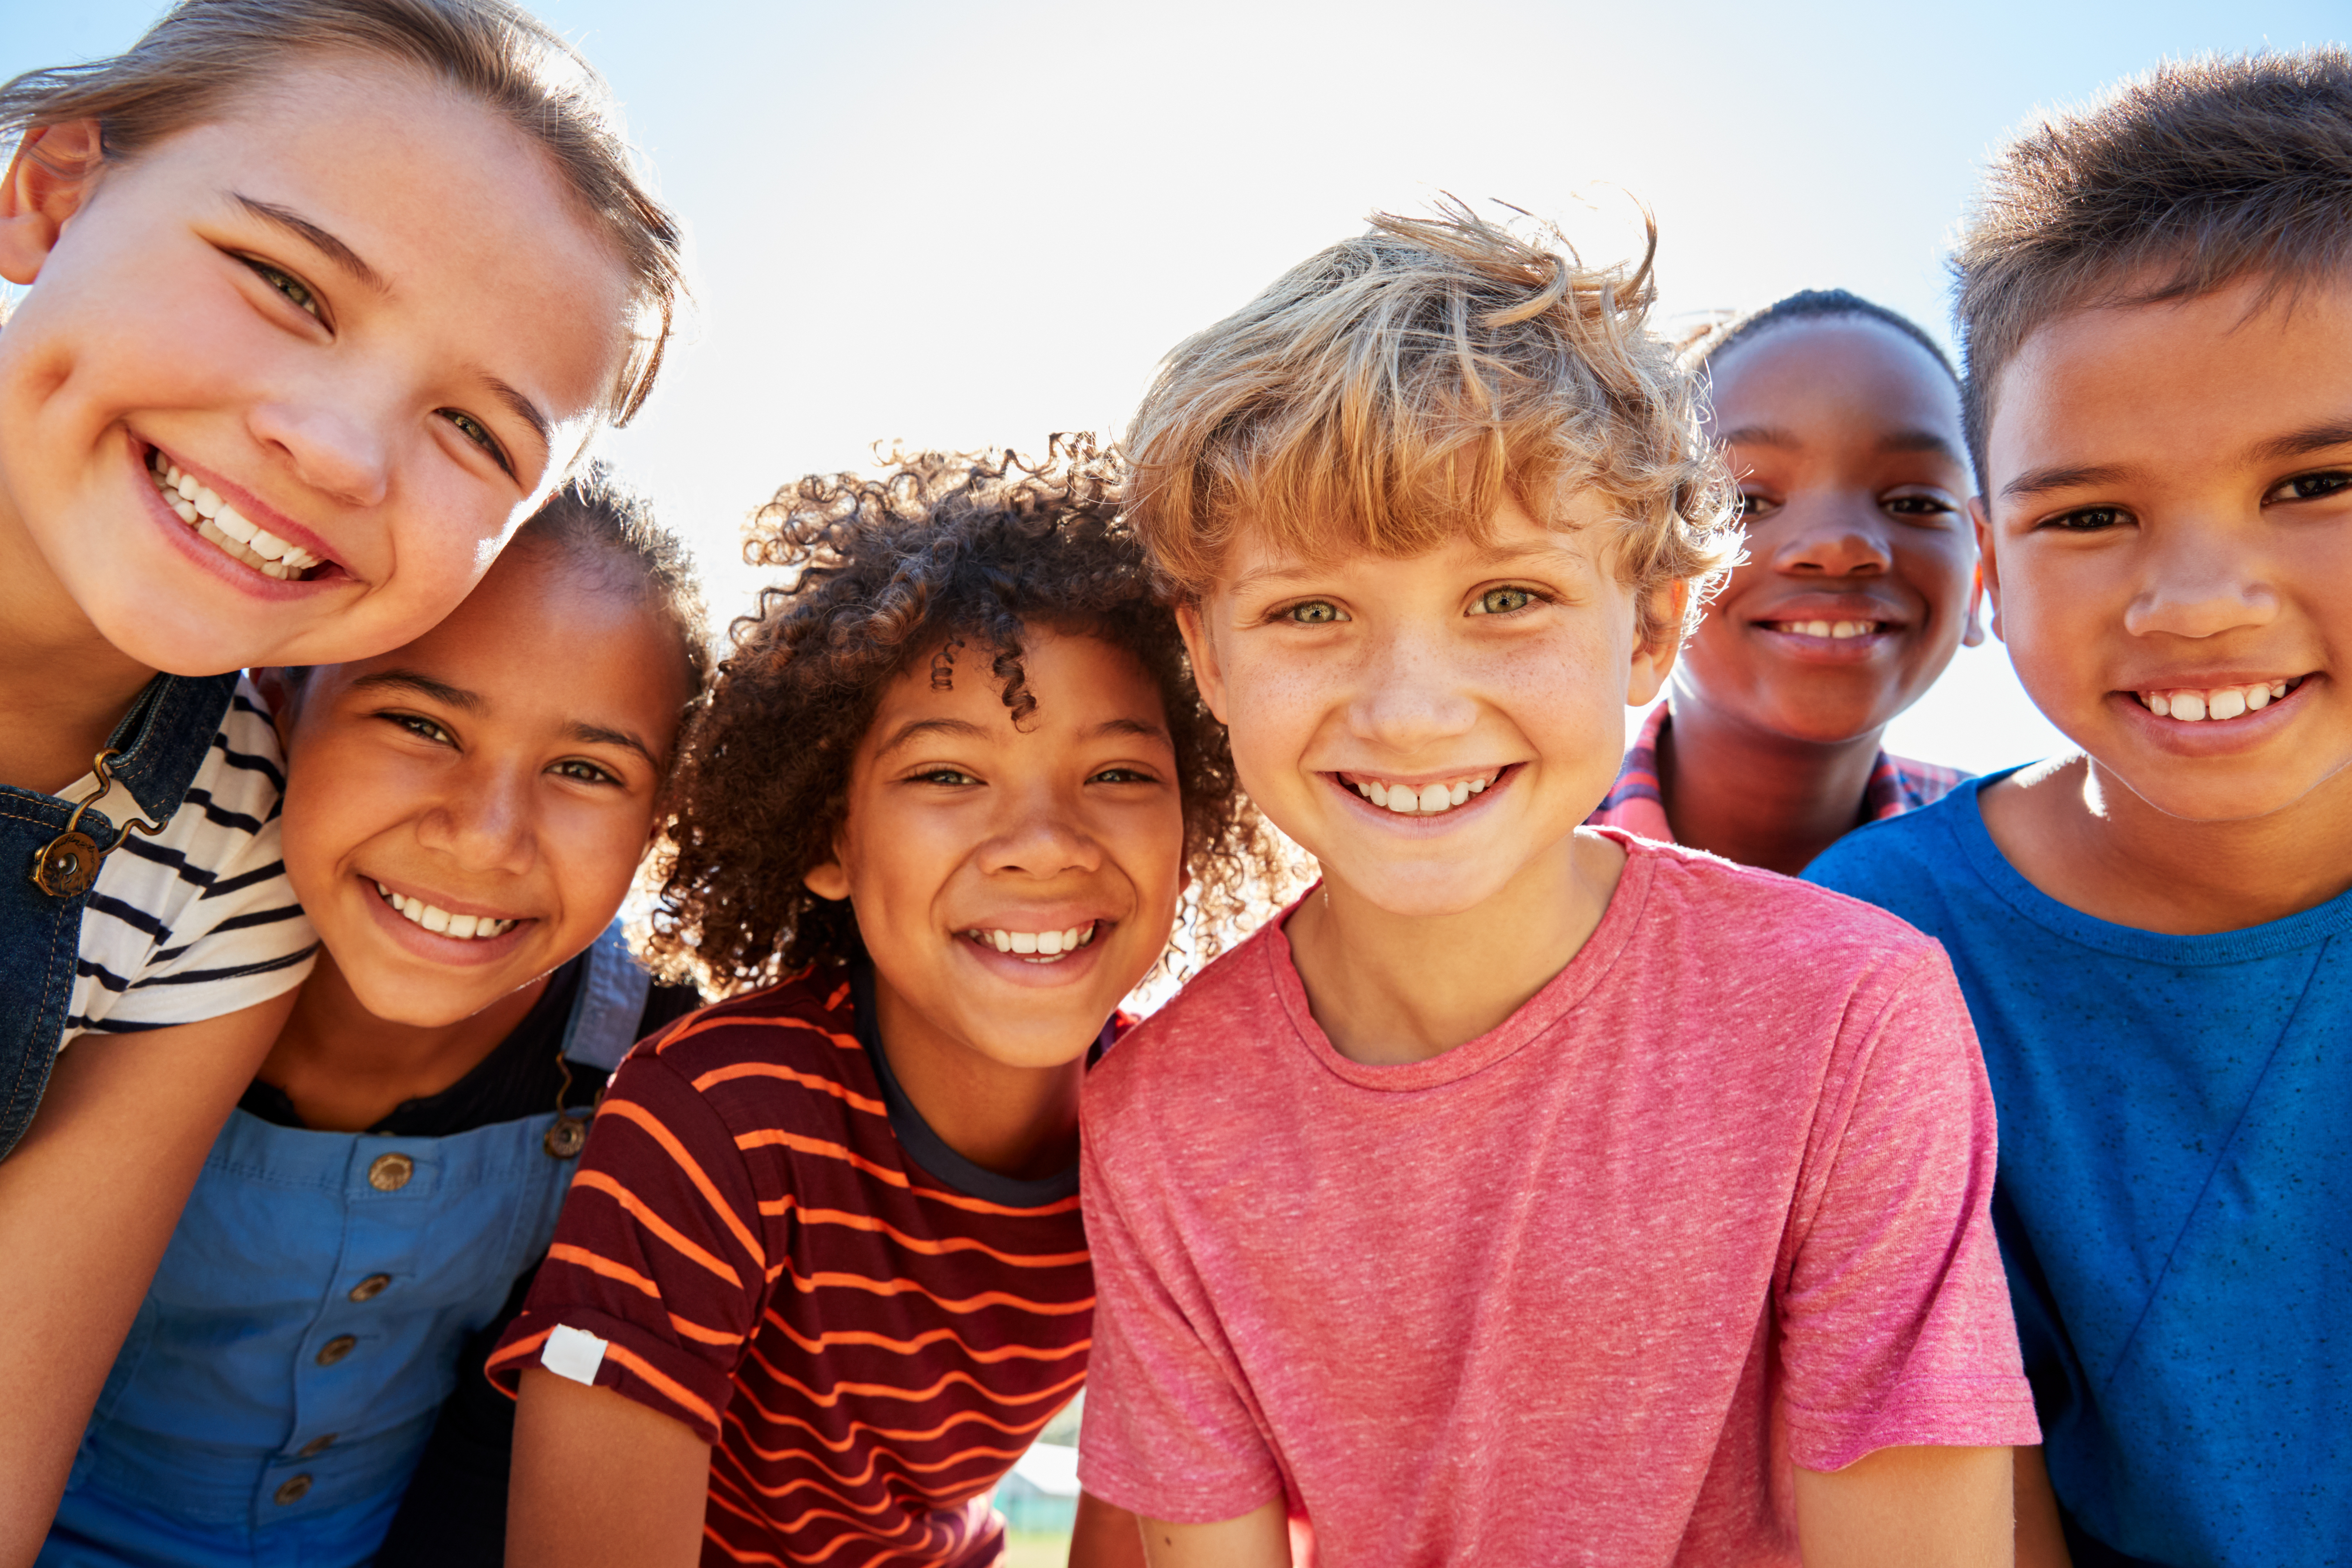 smiling kids stock photo